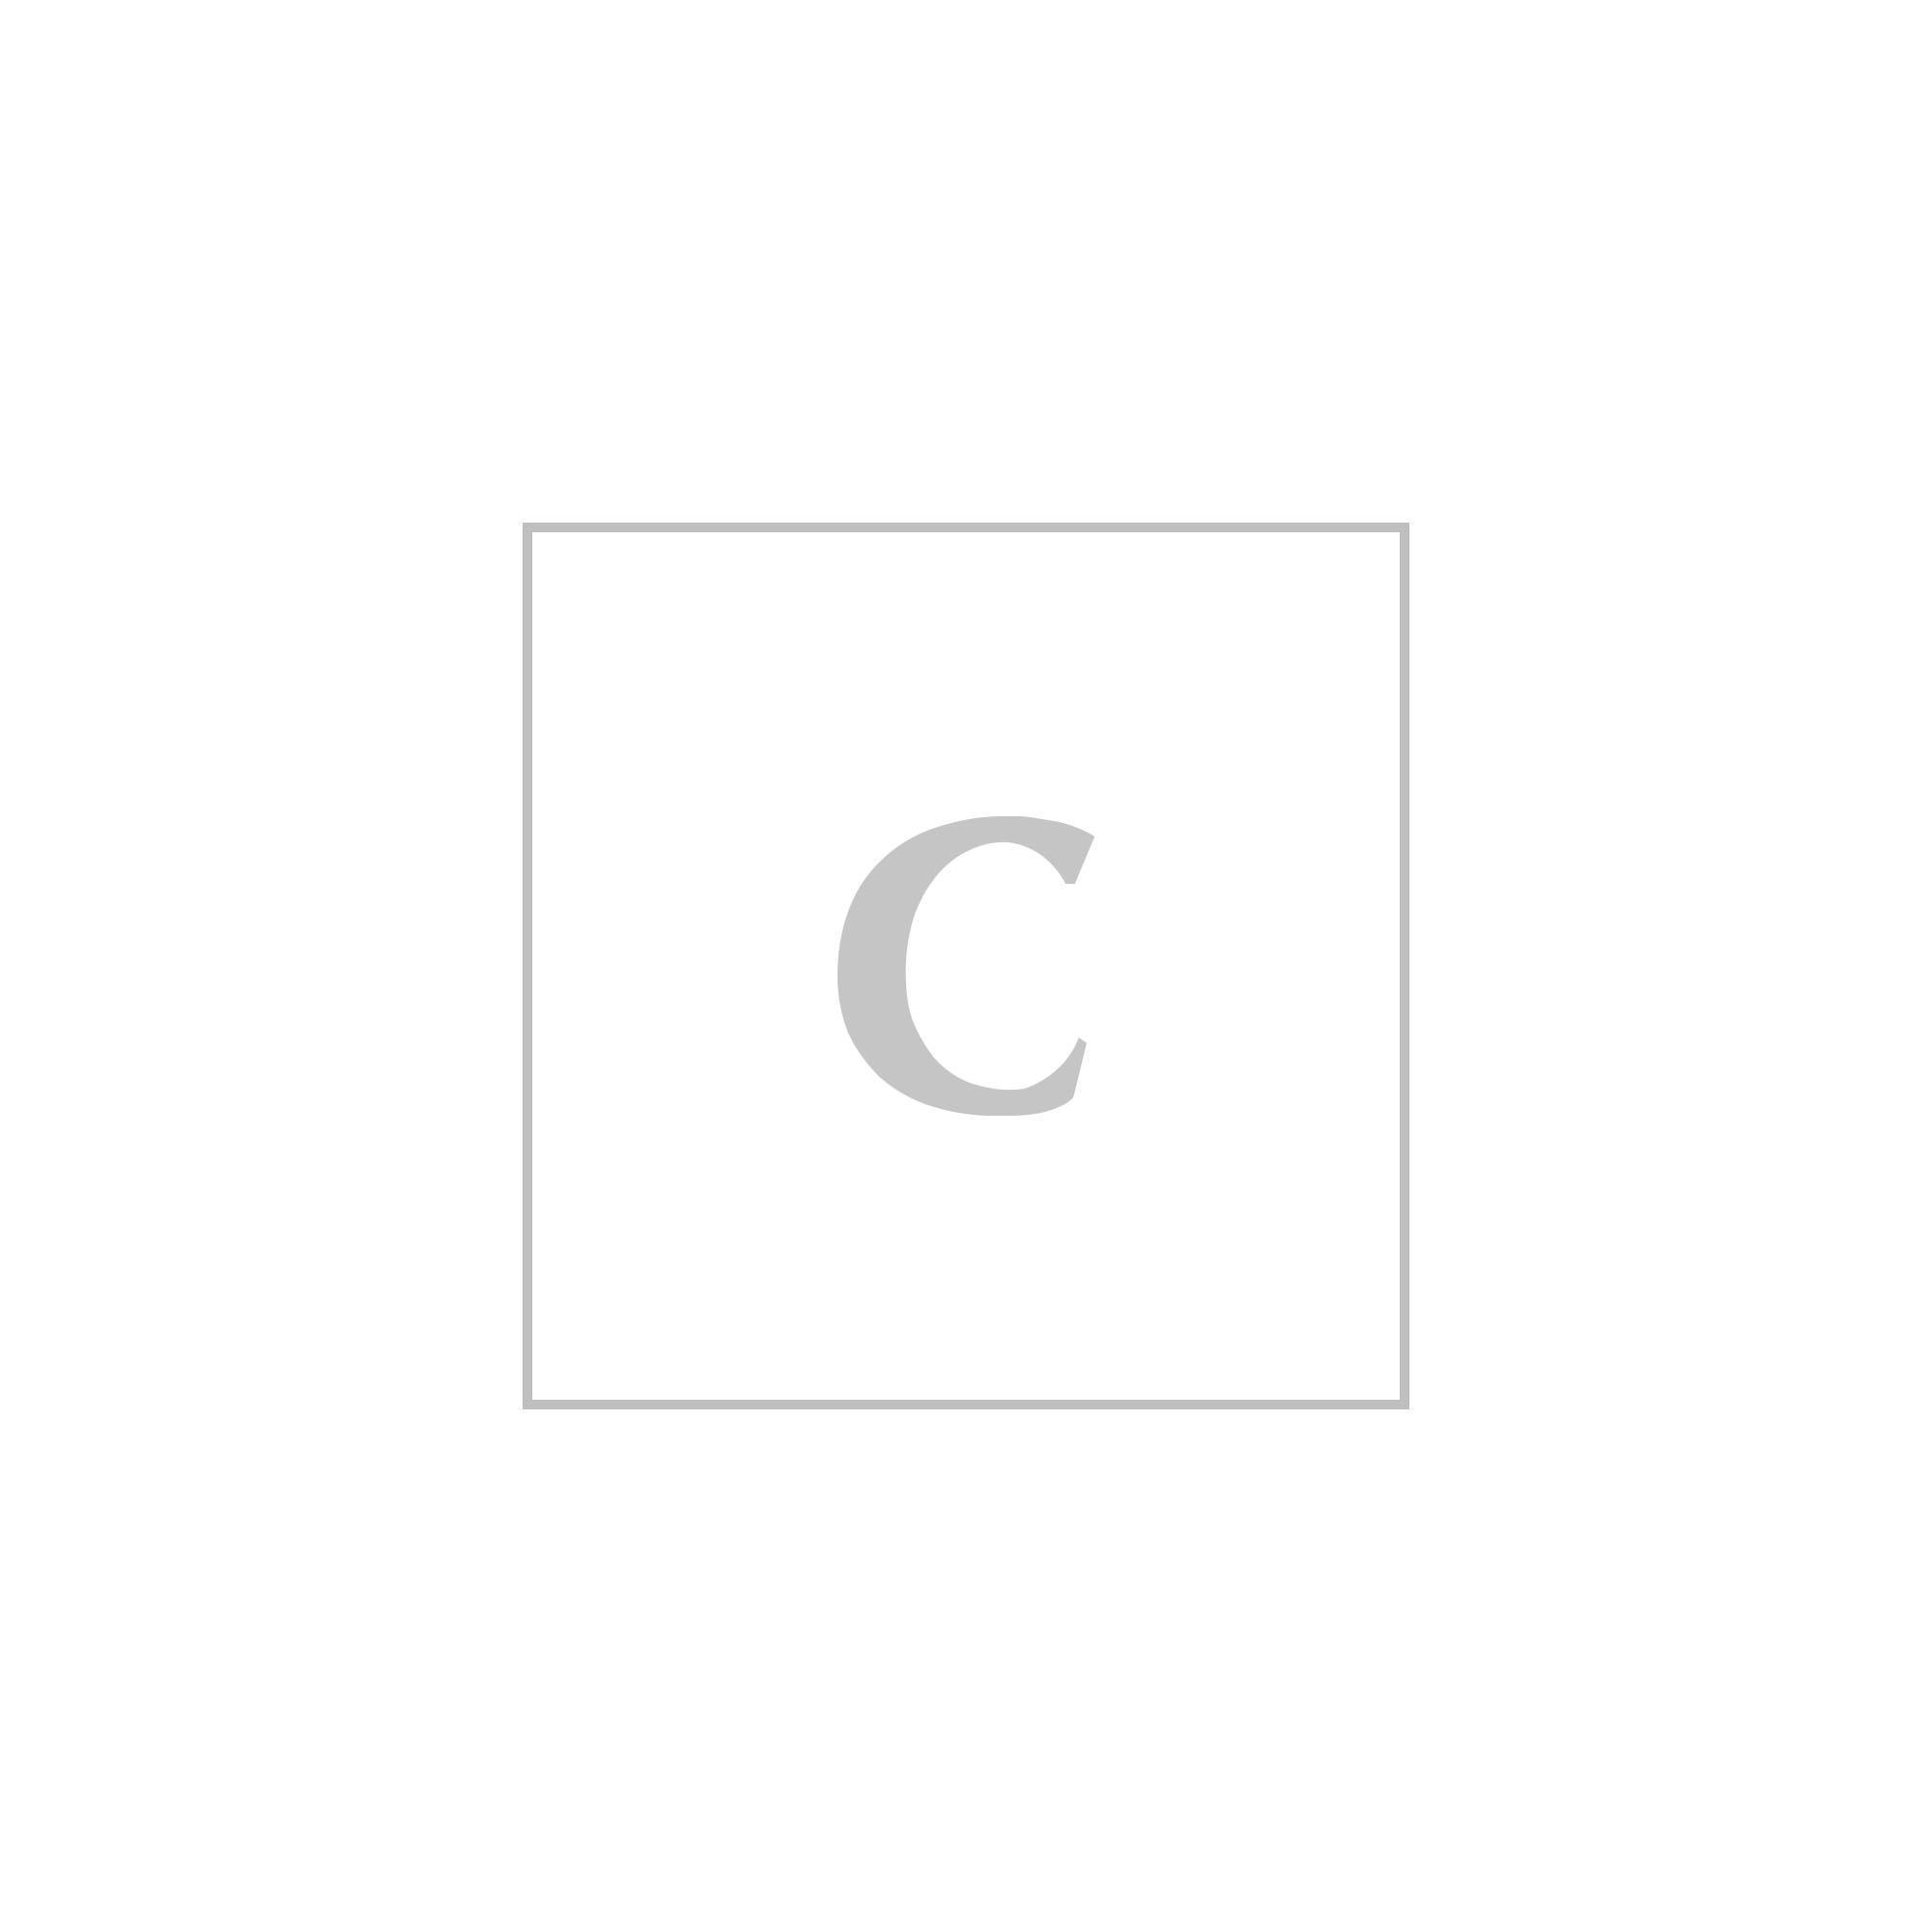 Dolce & gabbana decolletÉ pvc st.bianco/nero+v